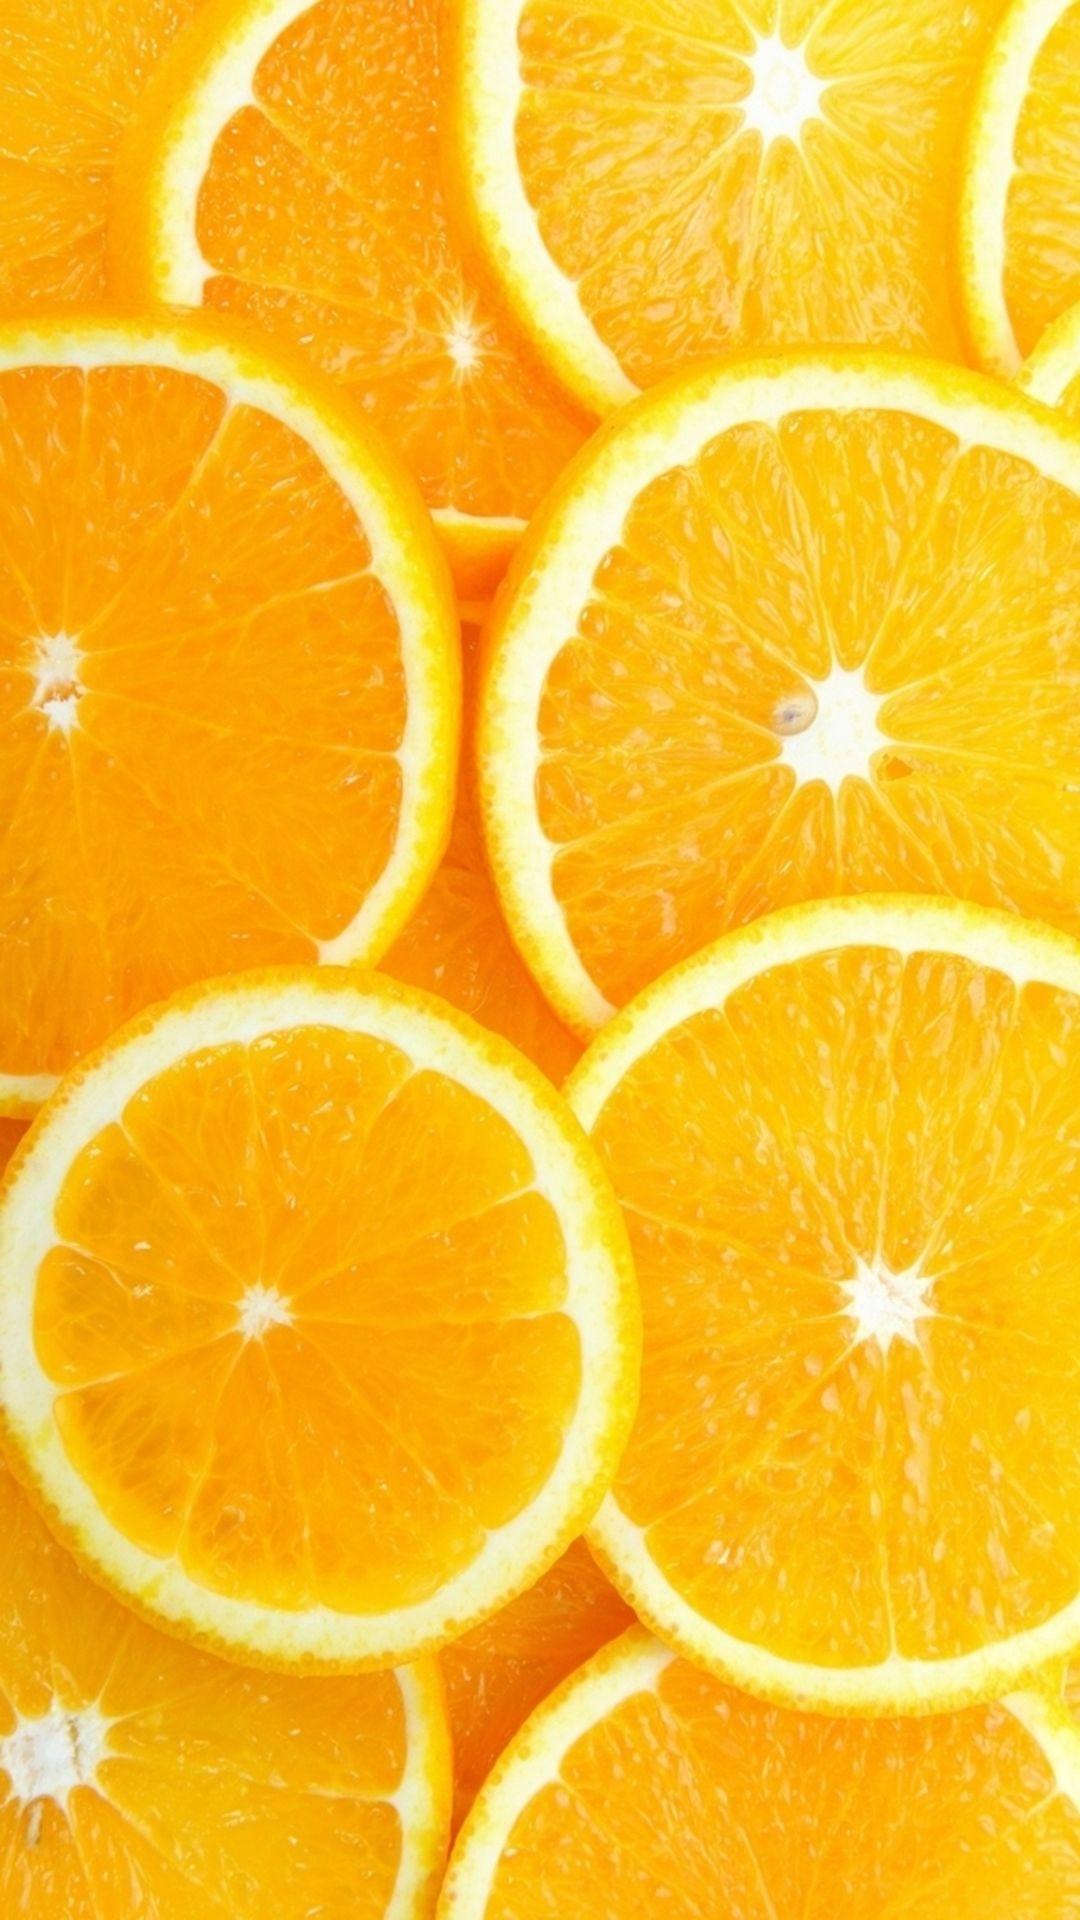 Fruit Orange Slice Overlap Background iPhone 8 Wallpapers